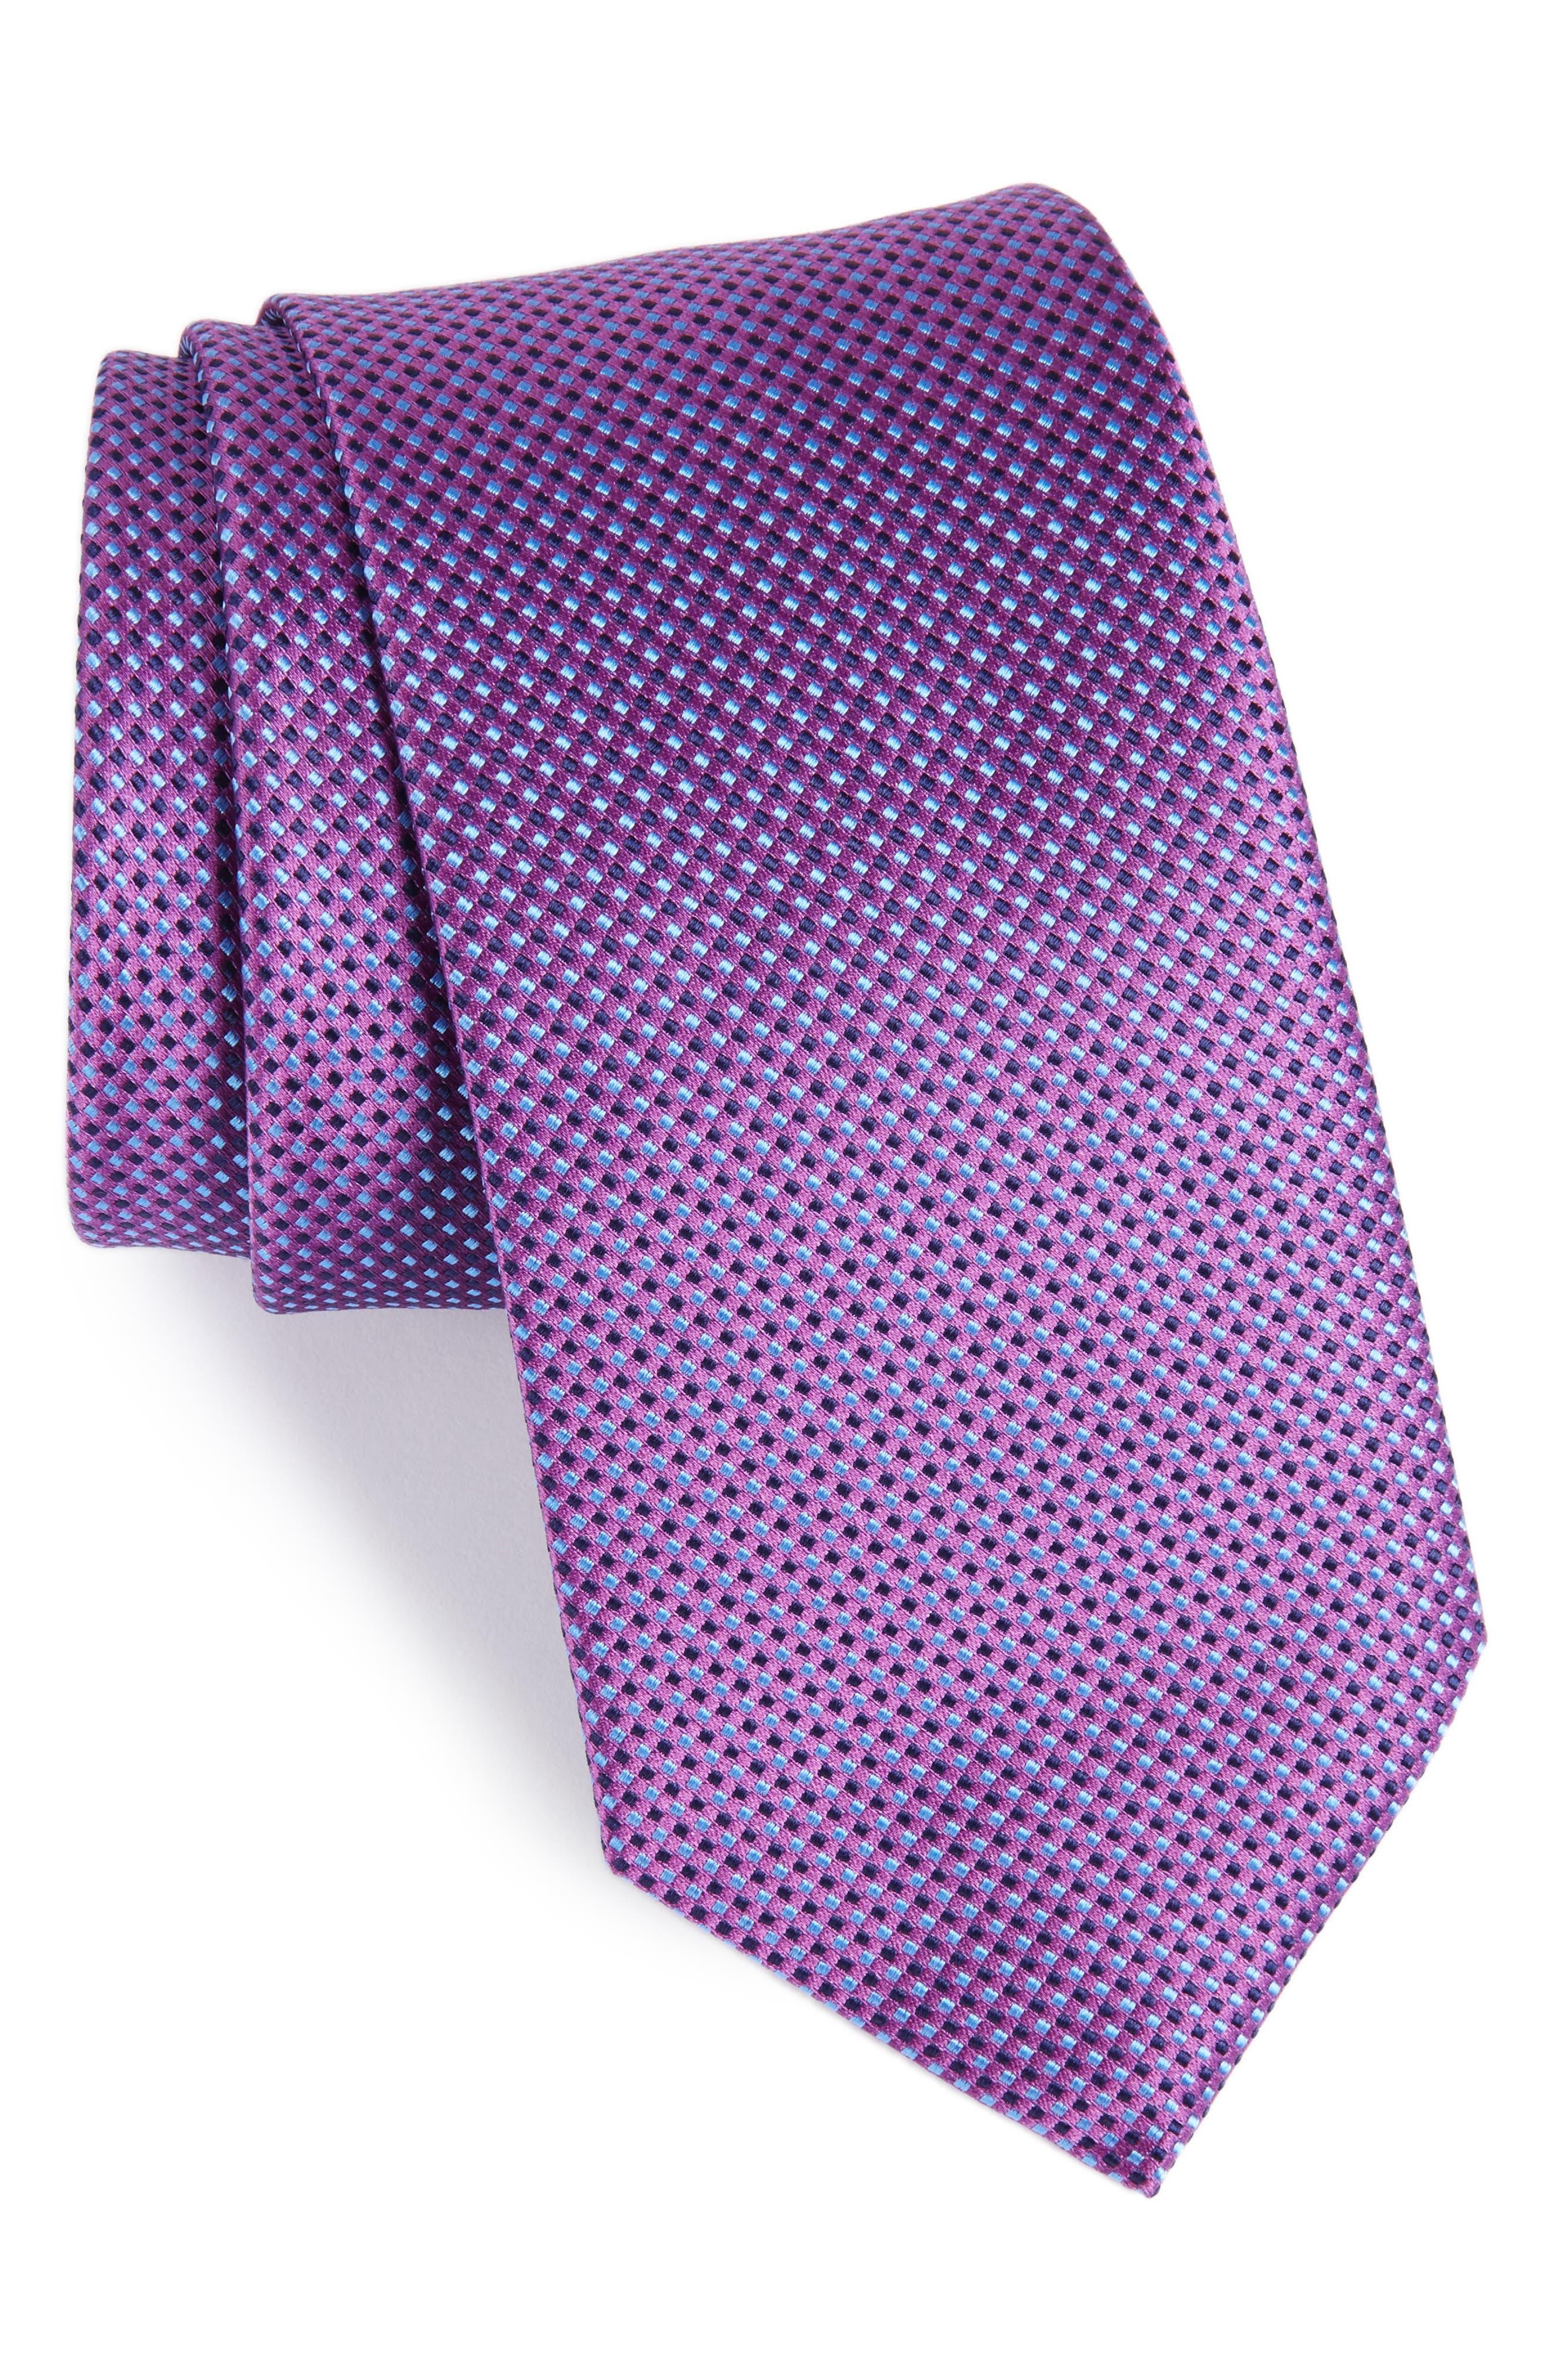 Microdot Silk Tie,                             Main thumbnail 1, color,                             Purple